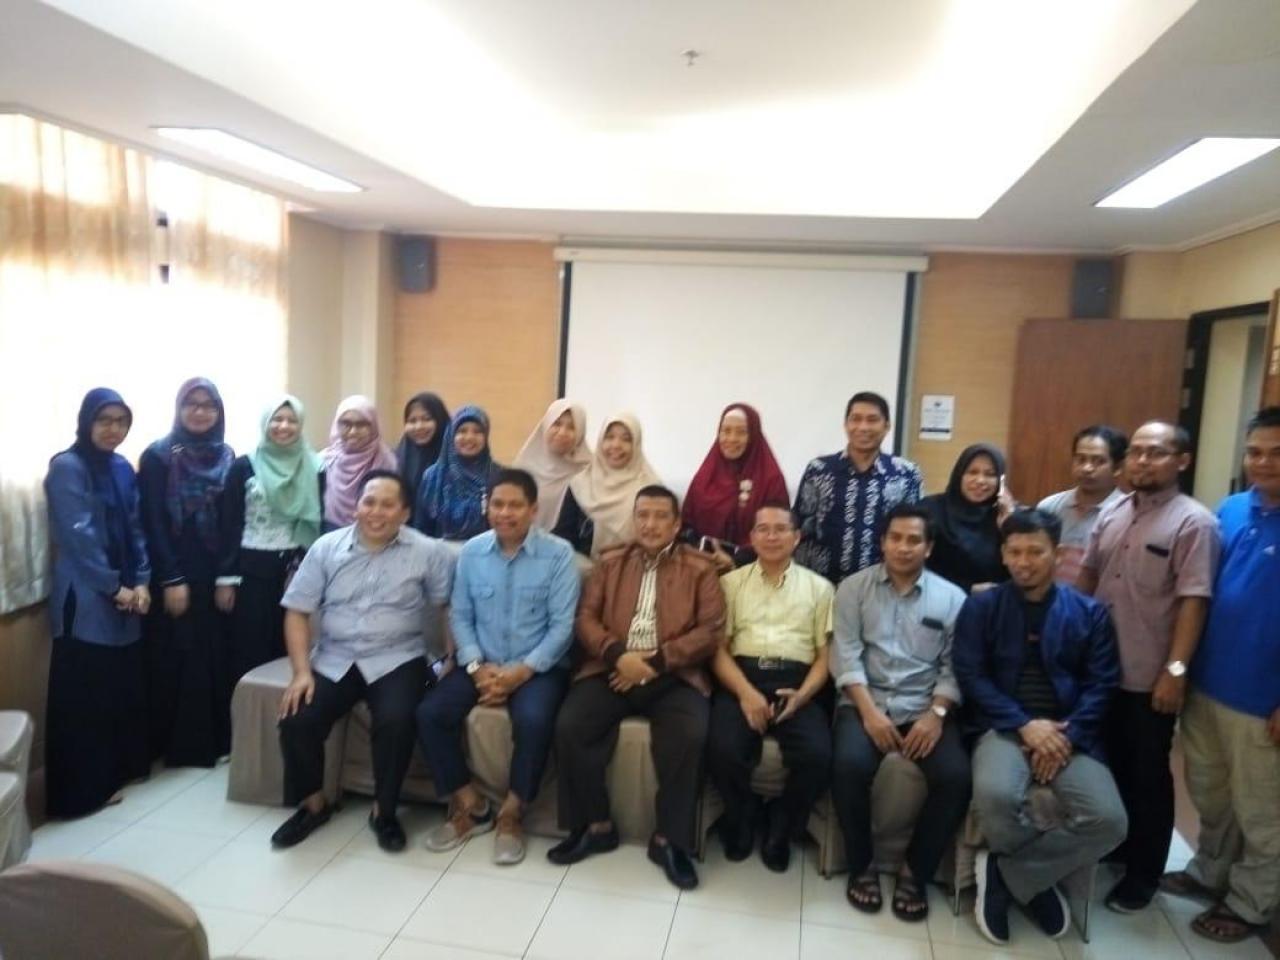 Tingkatkan Kualitas Kampus, UIN Alauddin Gelar Coaching Clinic Borang Akreditasi